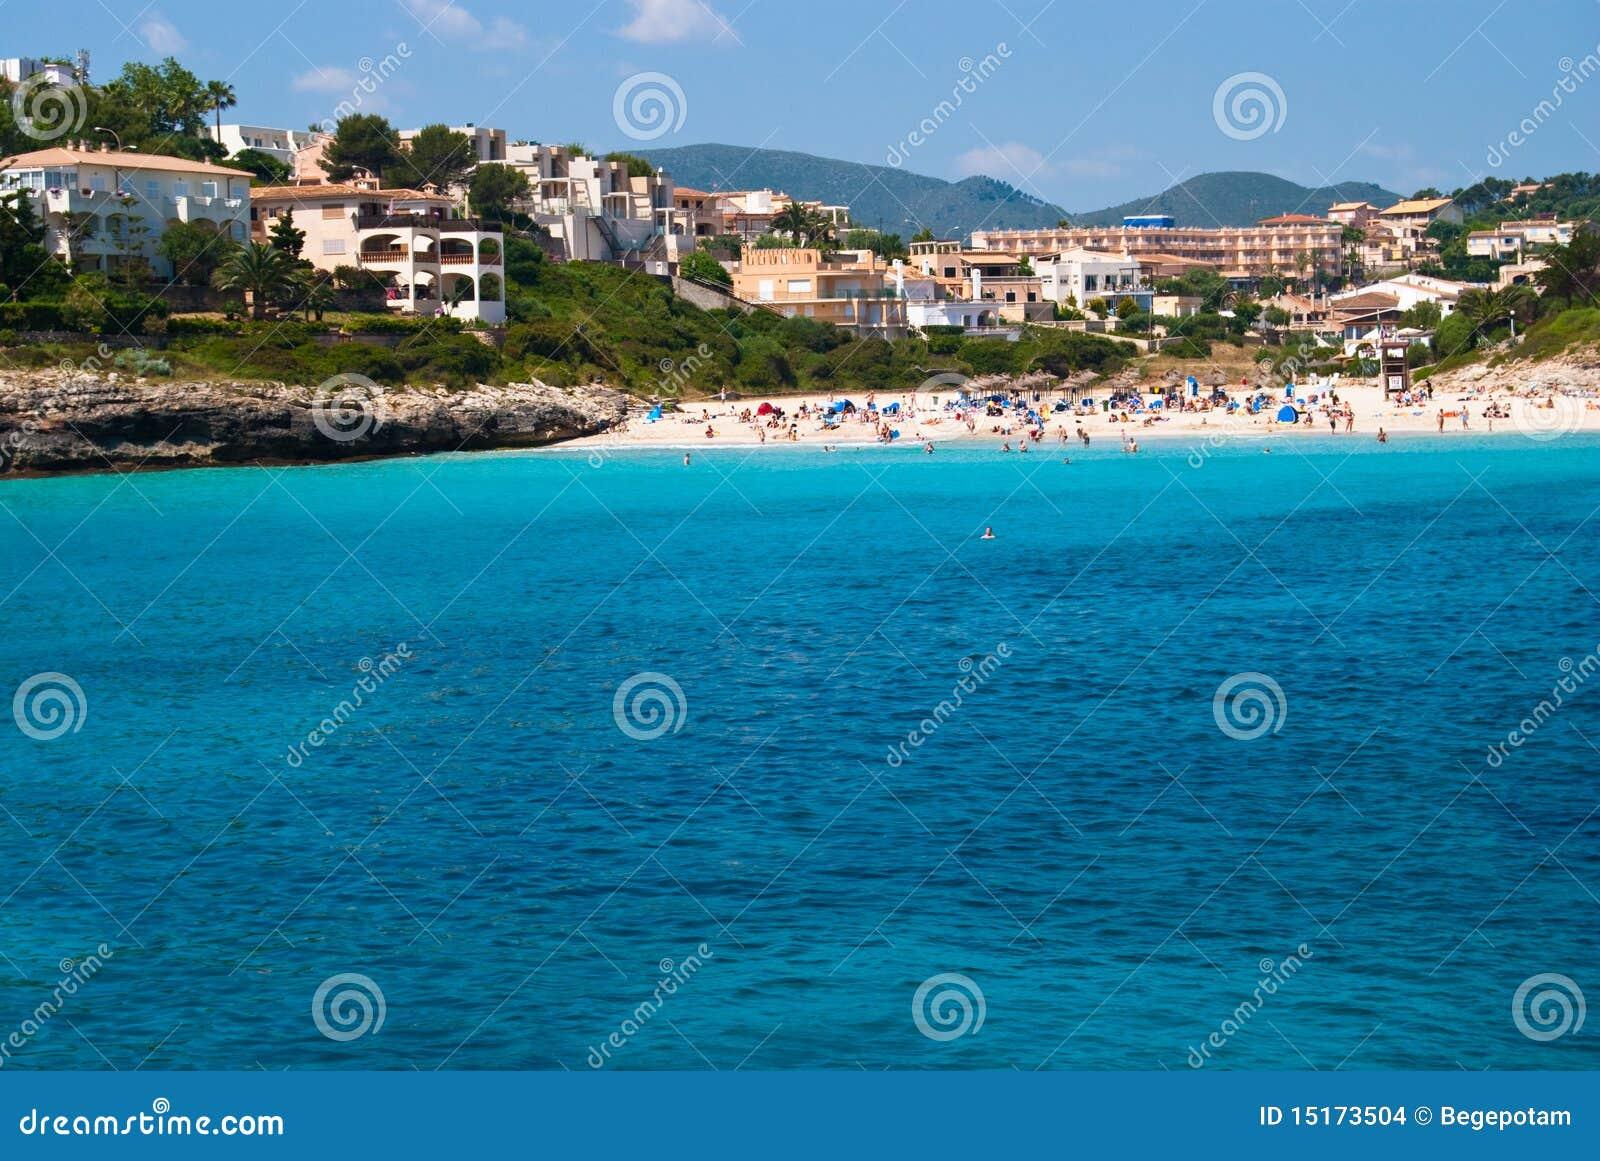 Cala Romantica Spain  City pictures : Cala Romantica Coast And Hotels, Majorca, Spain Stock Images Image ...